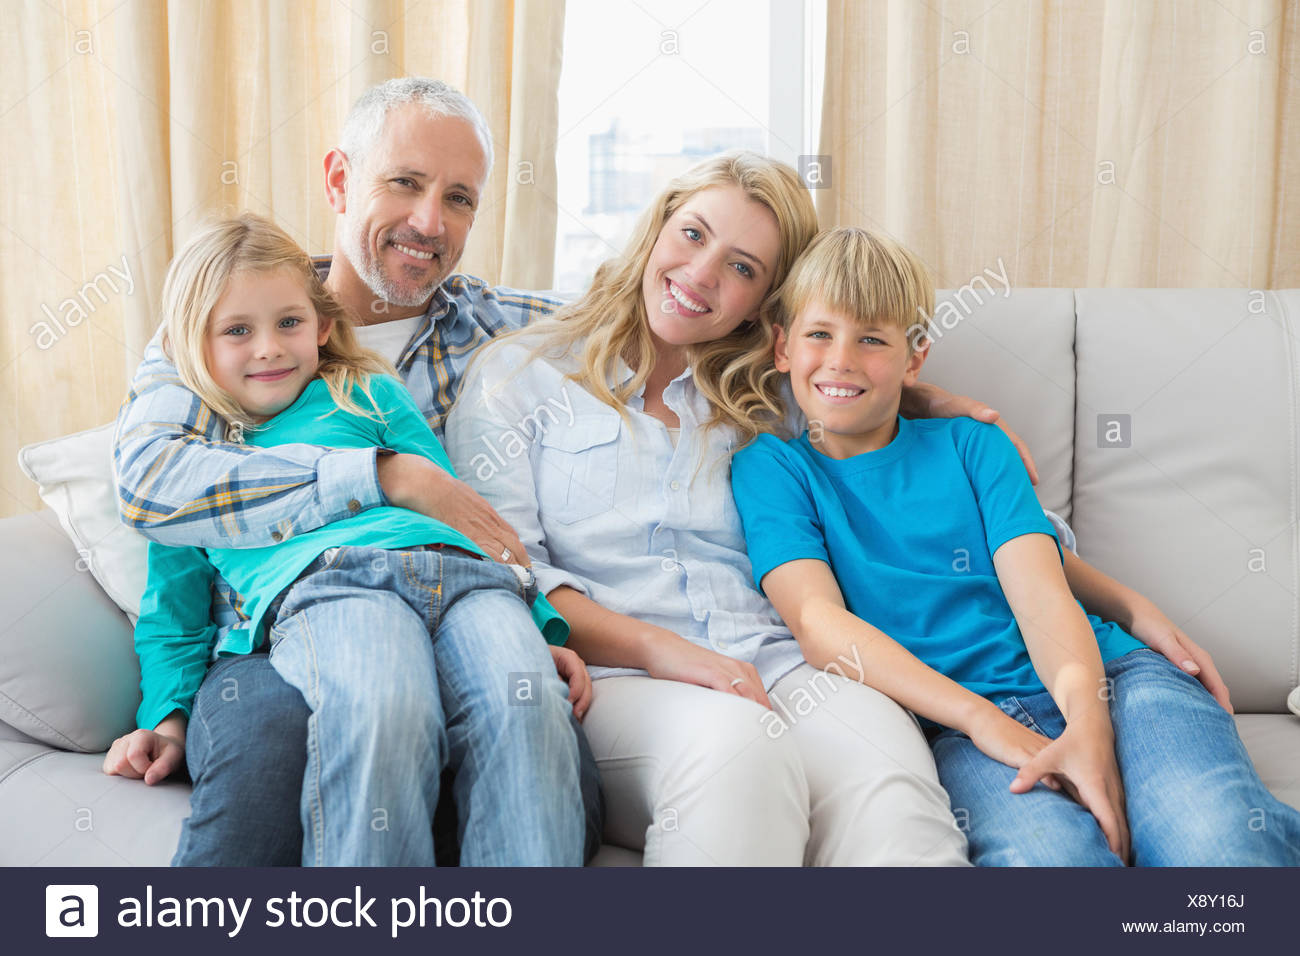 Happy family smiling at camera - Stock Image